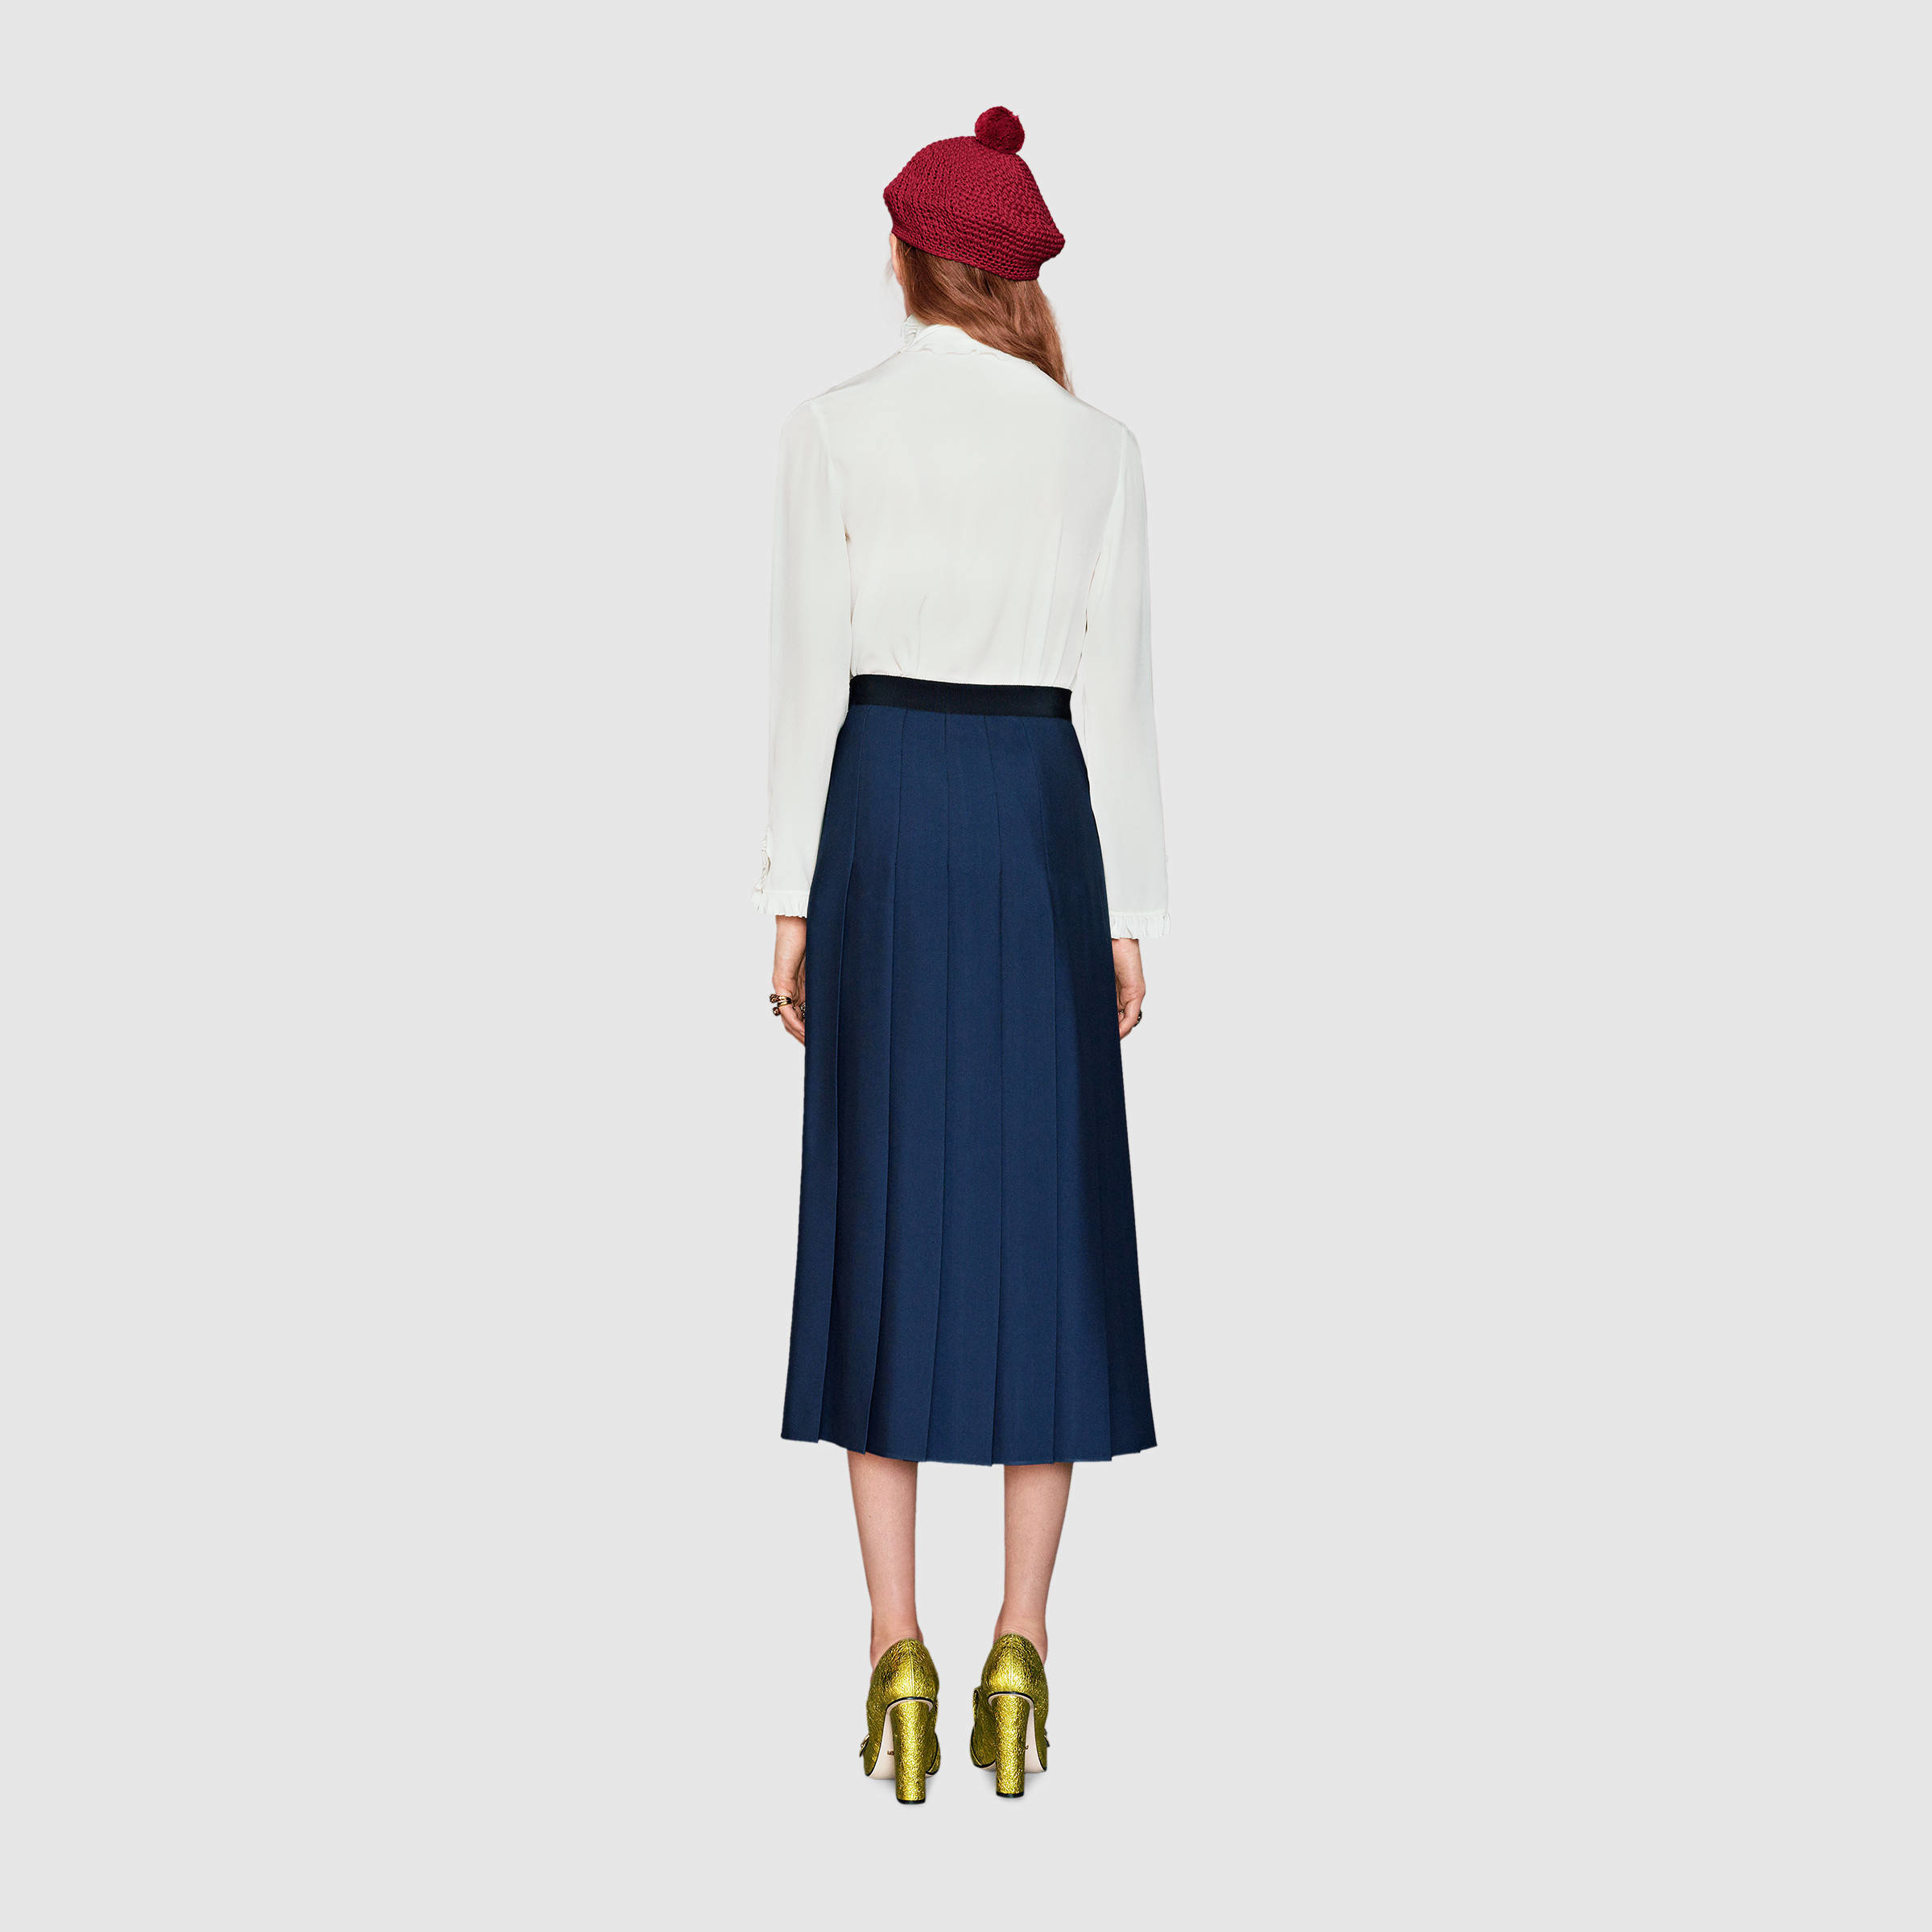 Gucci Wool-silk Pleated Skirt in Blue | Lyst